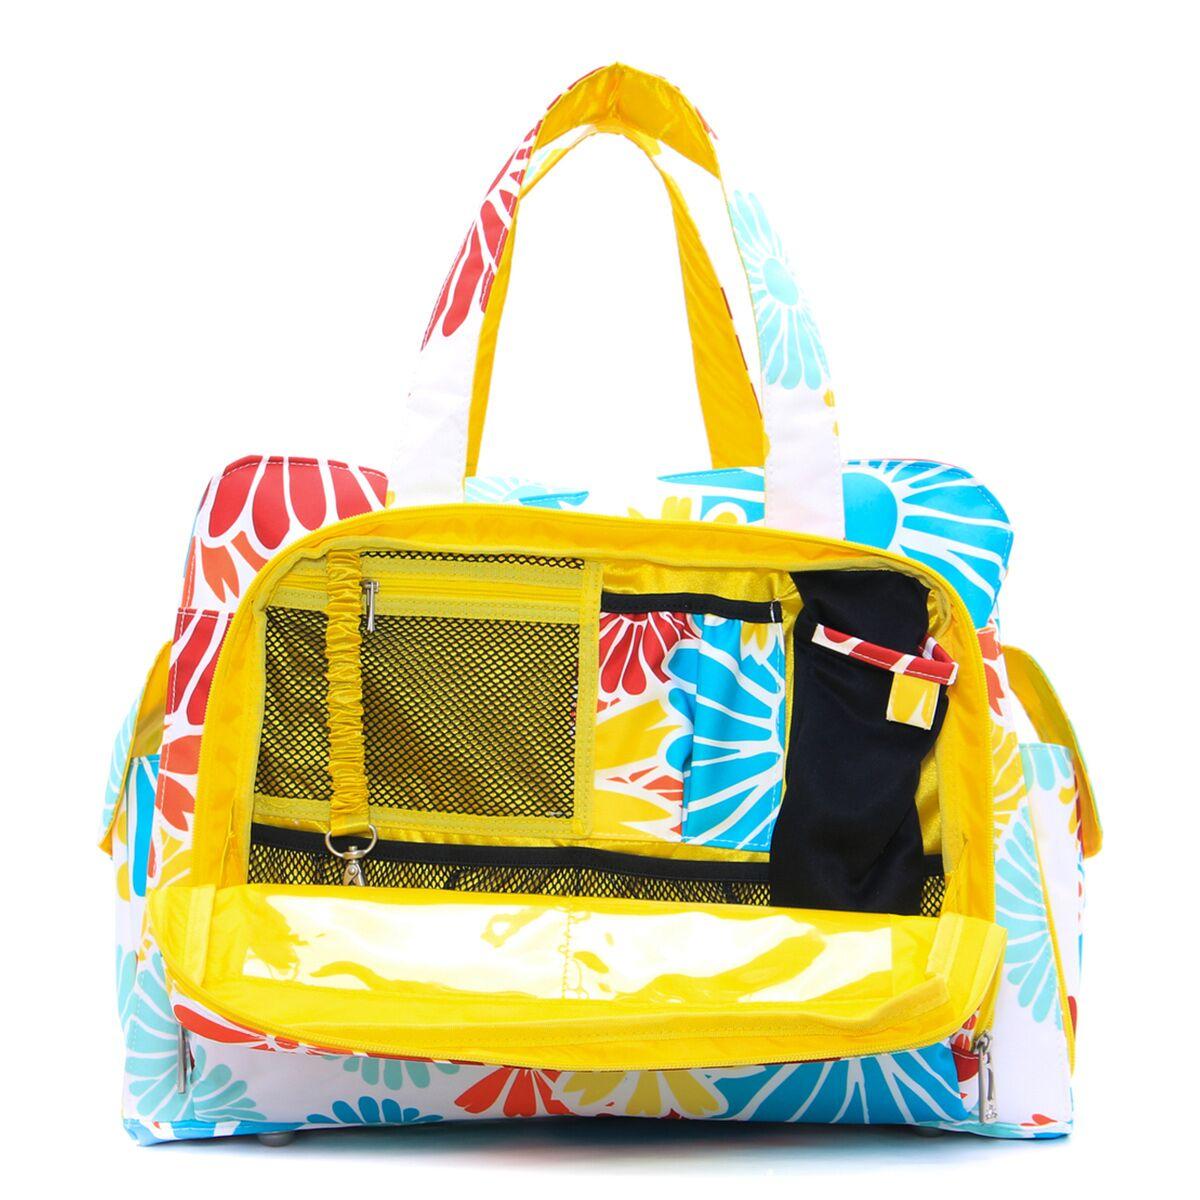 Дорожная сумка или сумка для двойни Ju-Ju-Be Be Prepared, Flower Power